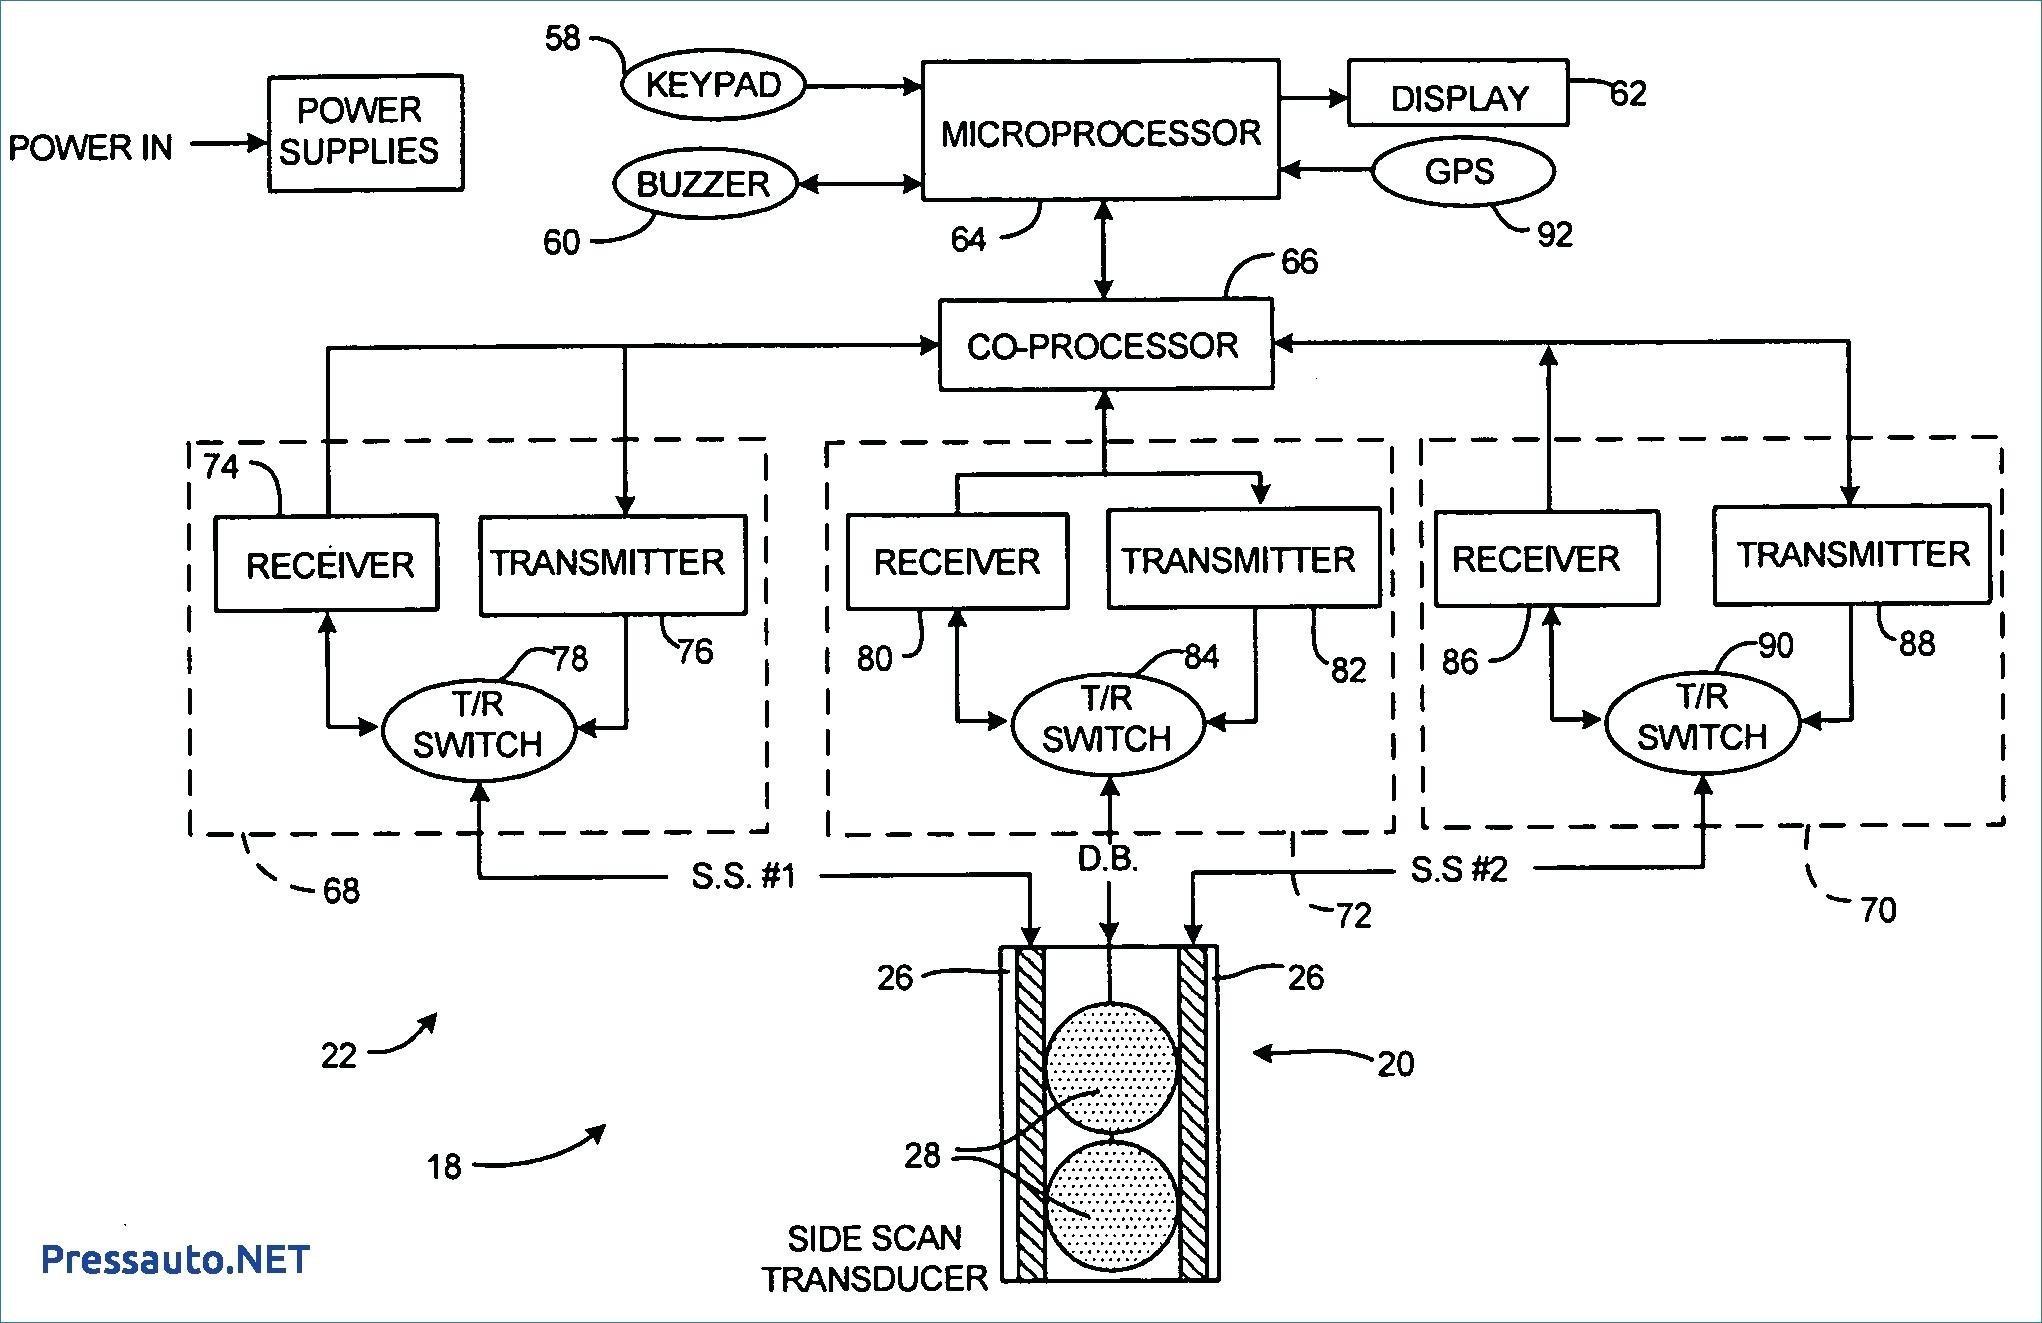 Lowrance Elite 5 Hdi Wiring Diagram from schematron.org